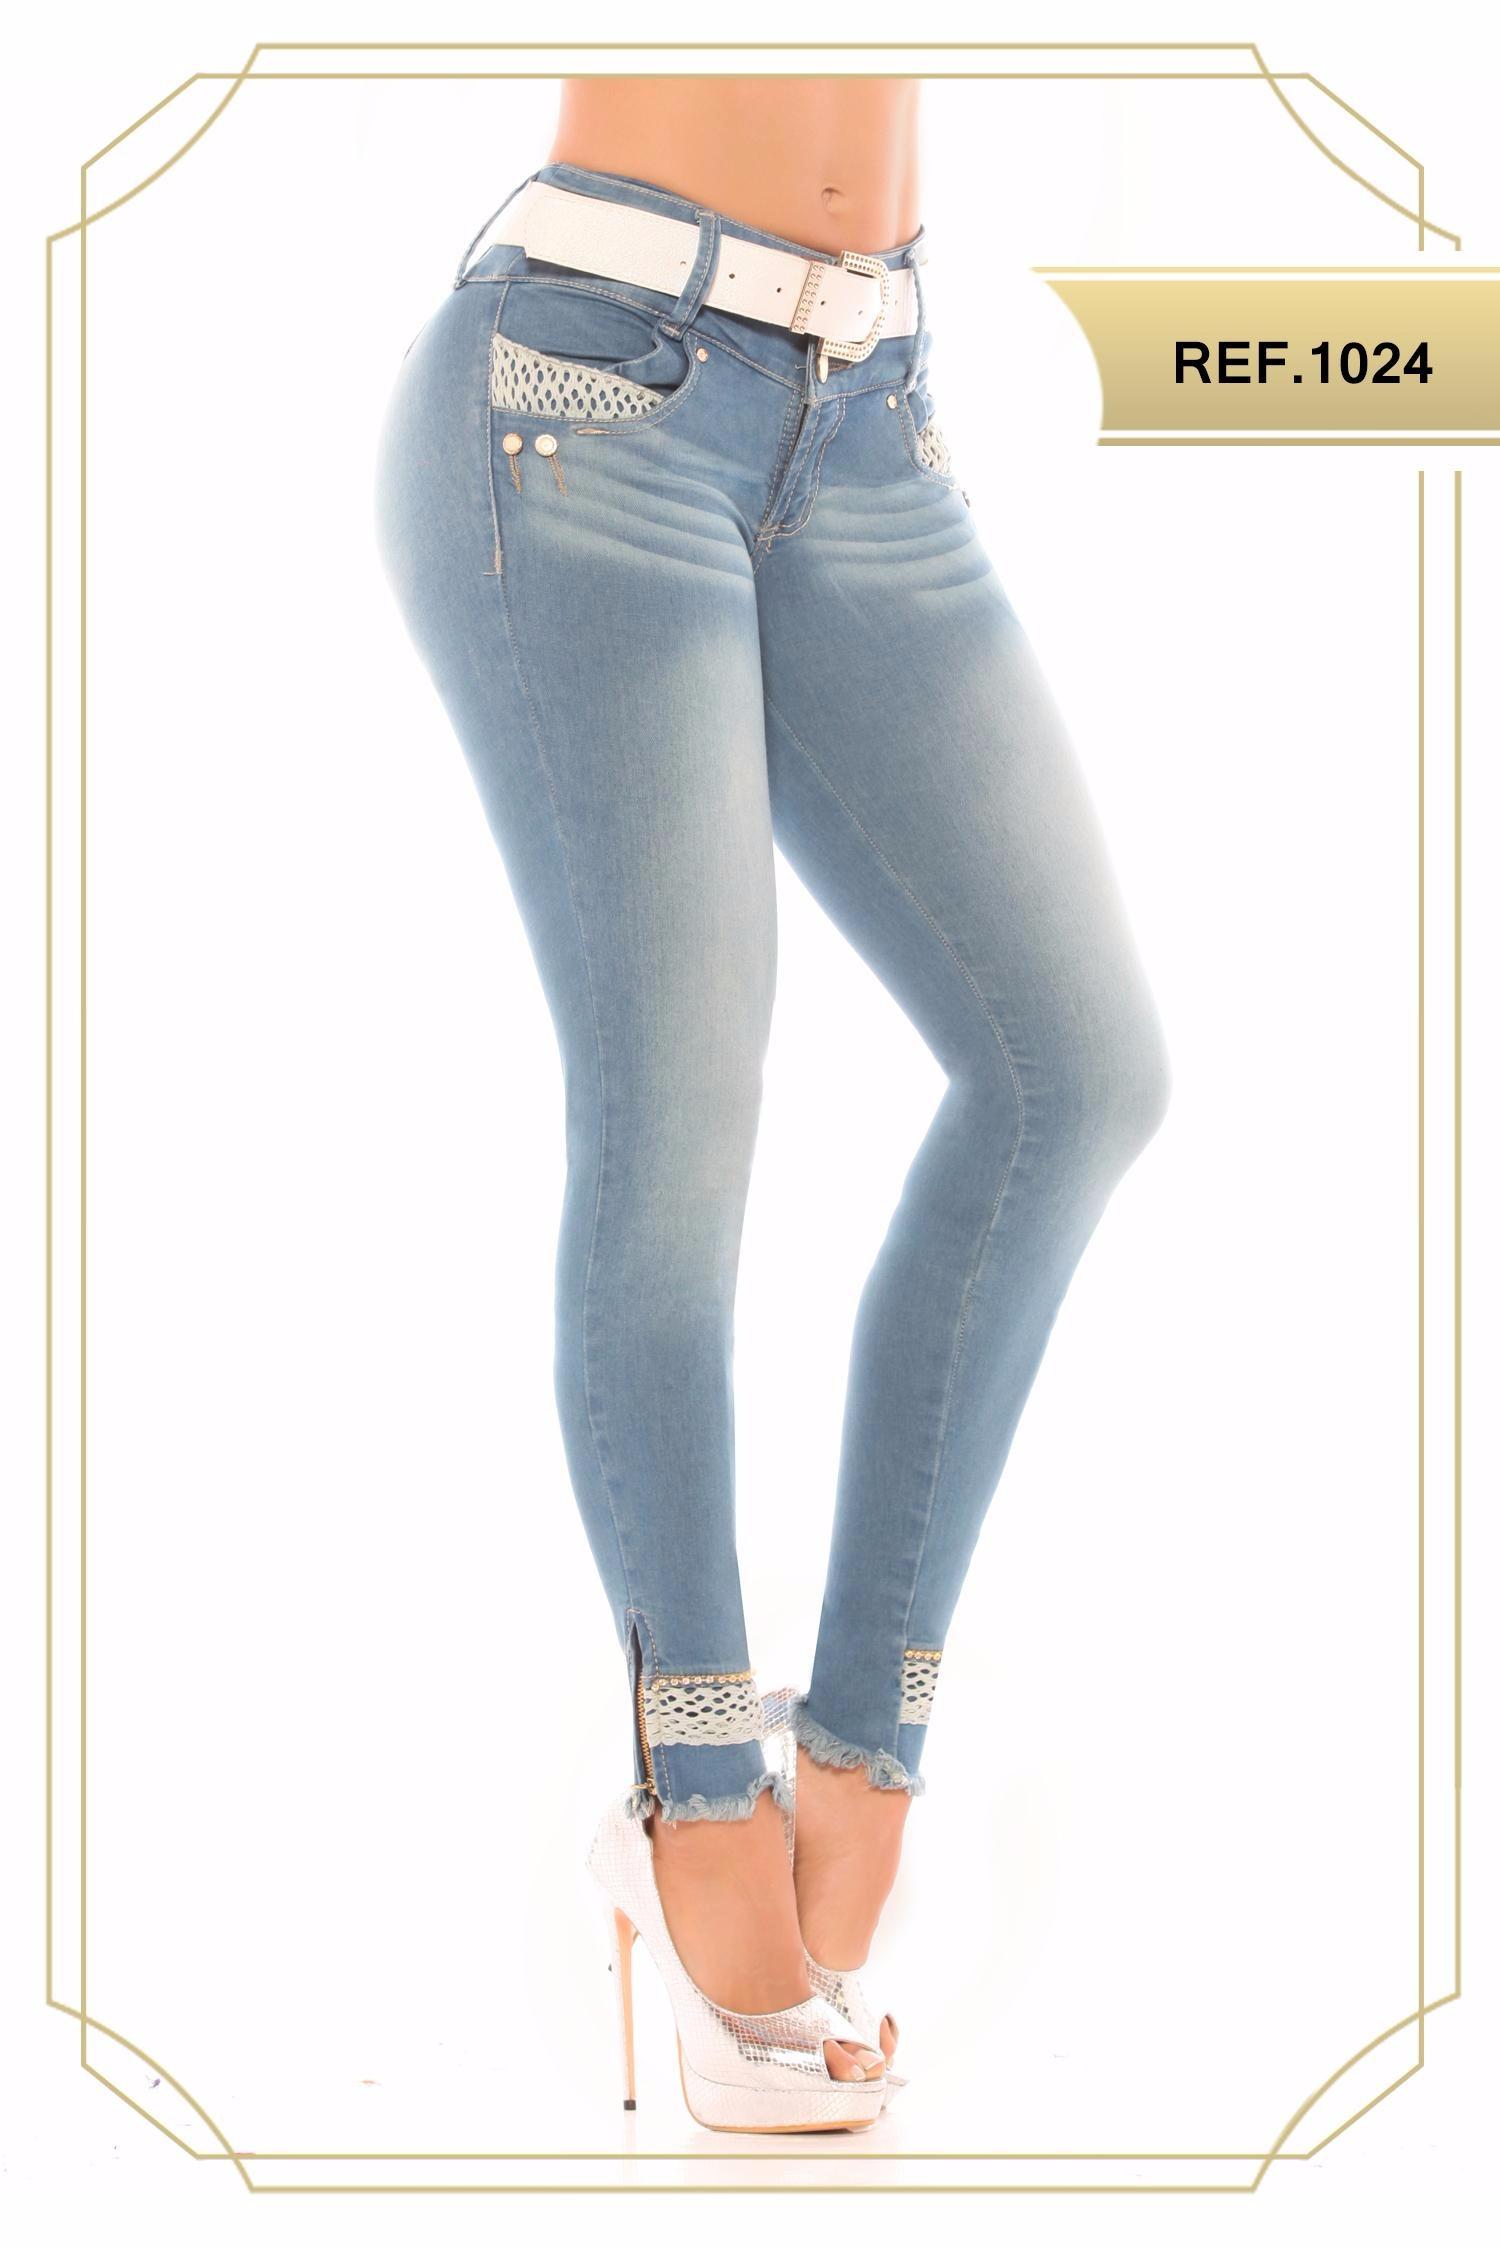 6d7f171663c Pantalones colombianos Joss Star ☎ 600 28 16 20 [PRECIOS BARATOS]